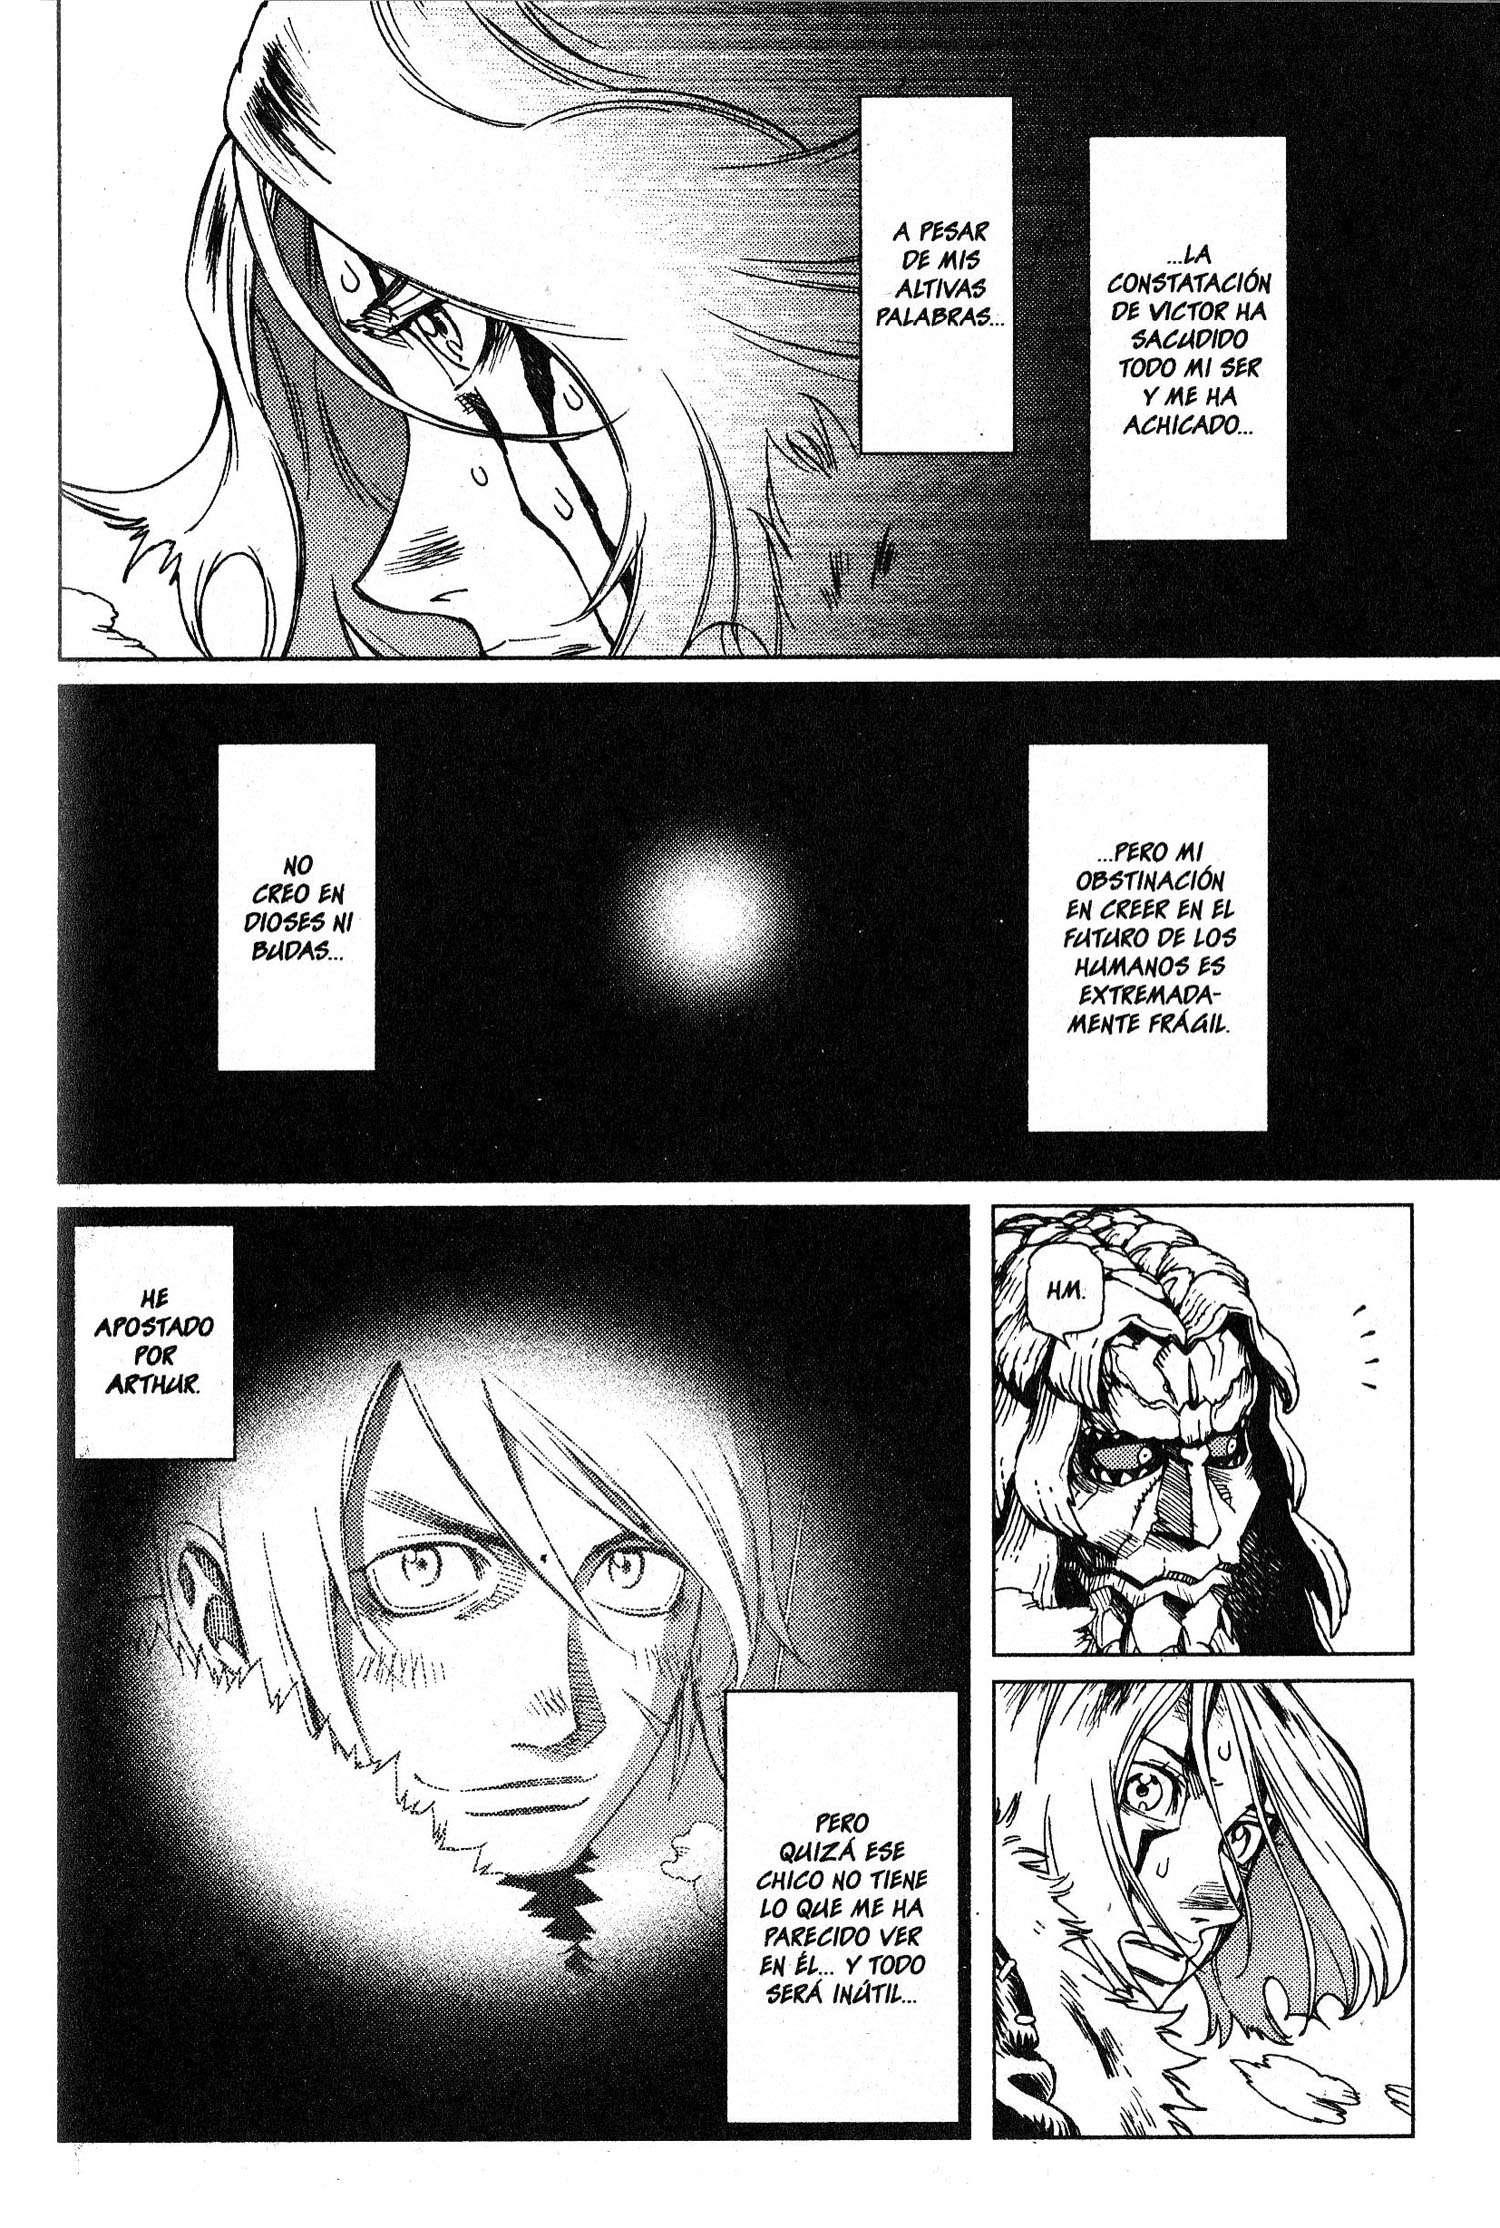 http://c5.ninemanga.com/es_manga/pic2/1/15873/523583/9bc99c590be3511b8d53741684ef574c.jpg Page 4